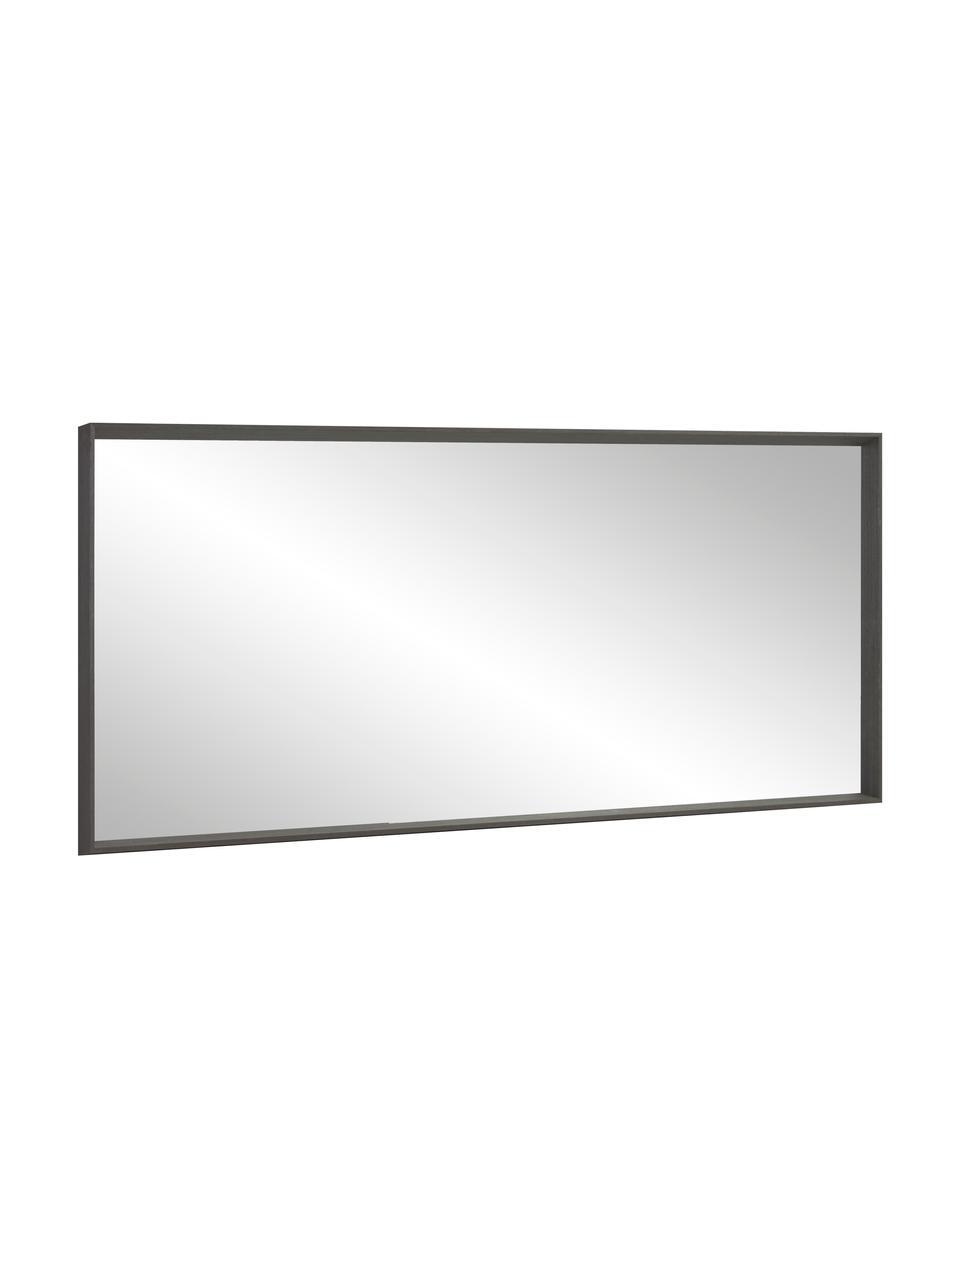 Leunende spiegel Nerina met houten lijst, Lijst: hout, Donkerbruin, 80 x 180 cm